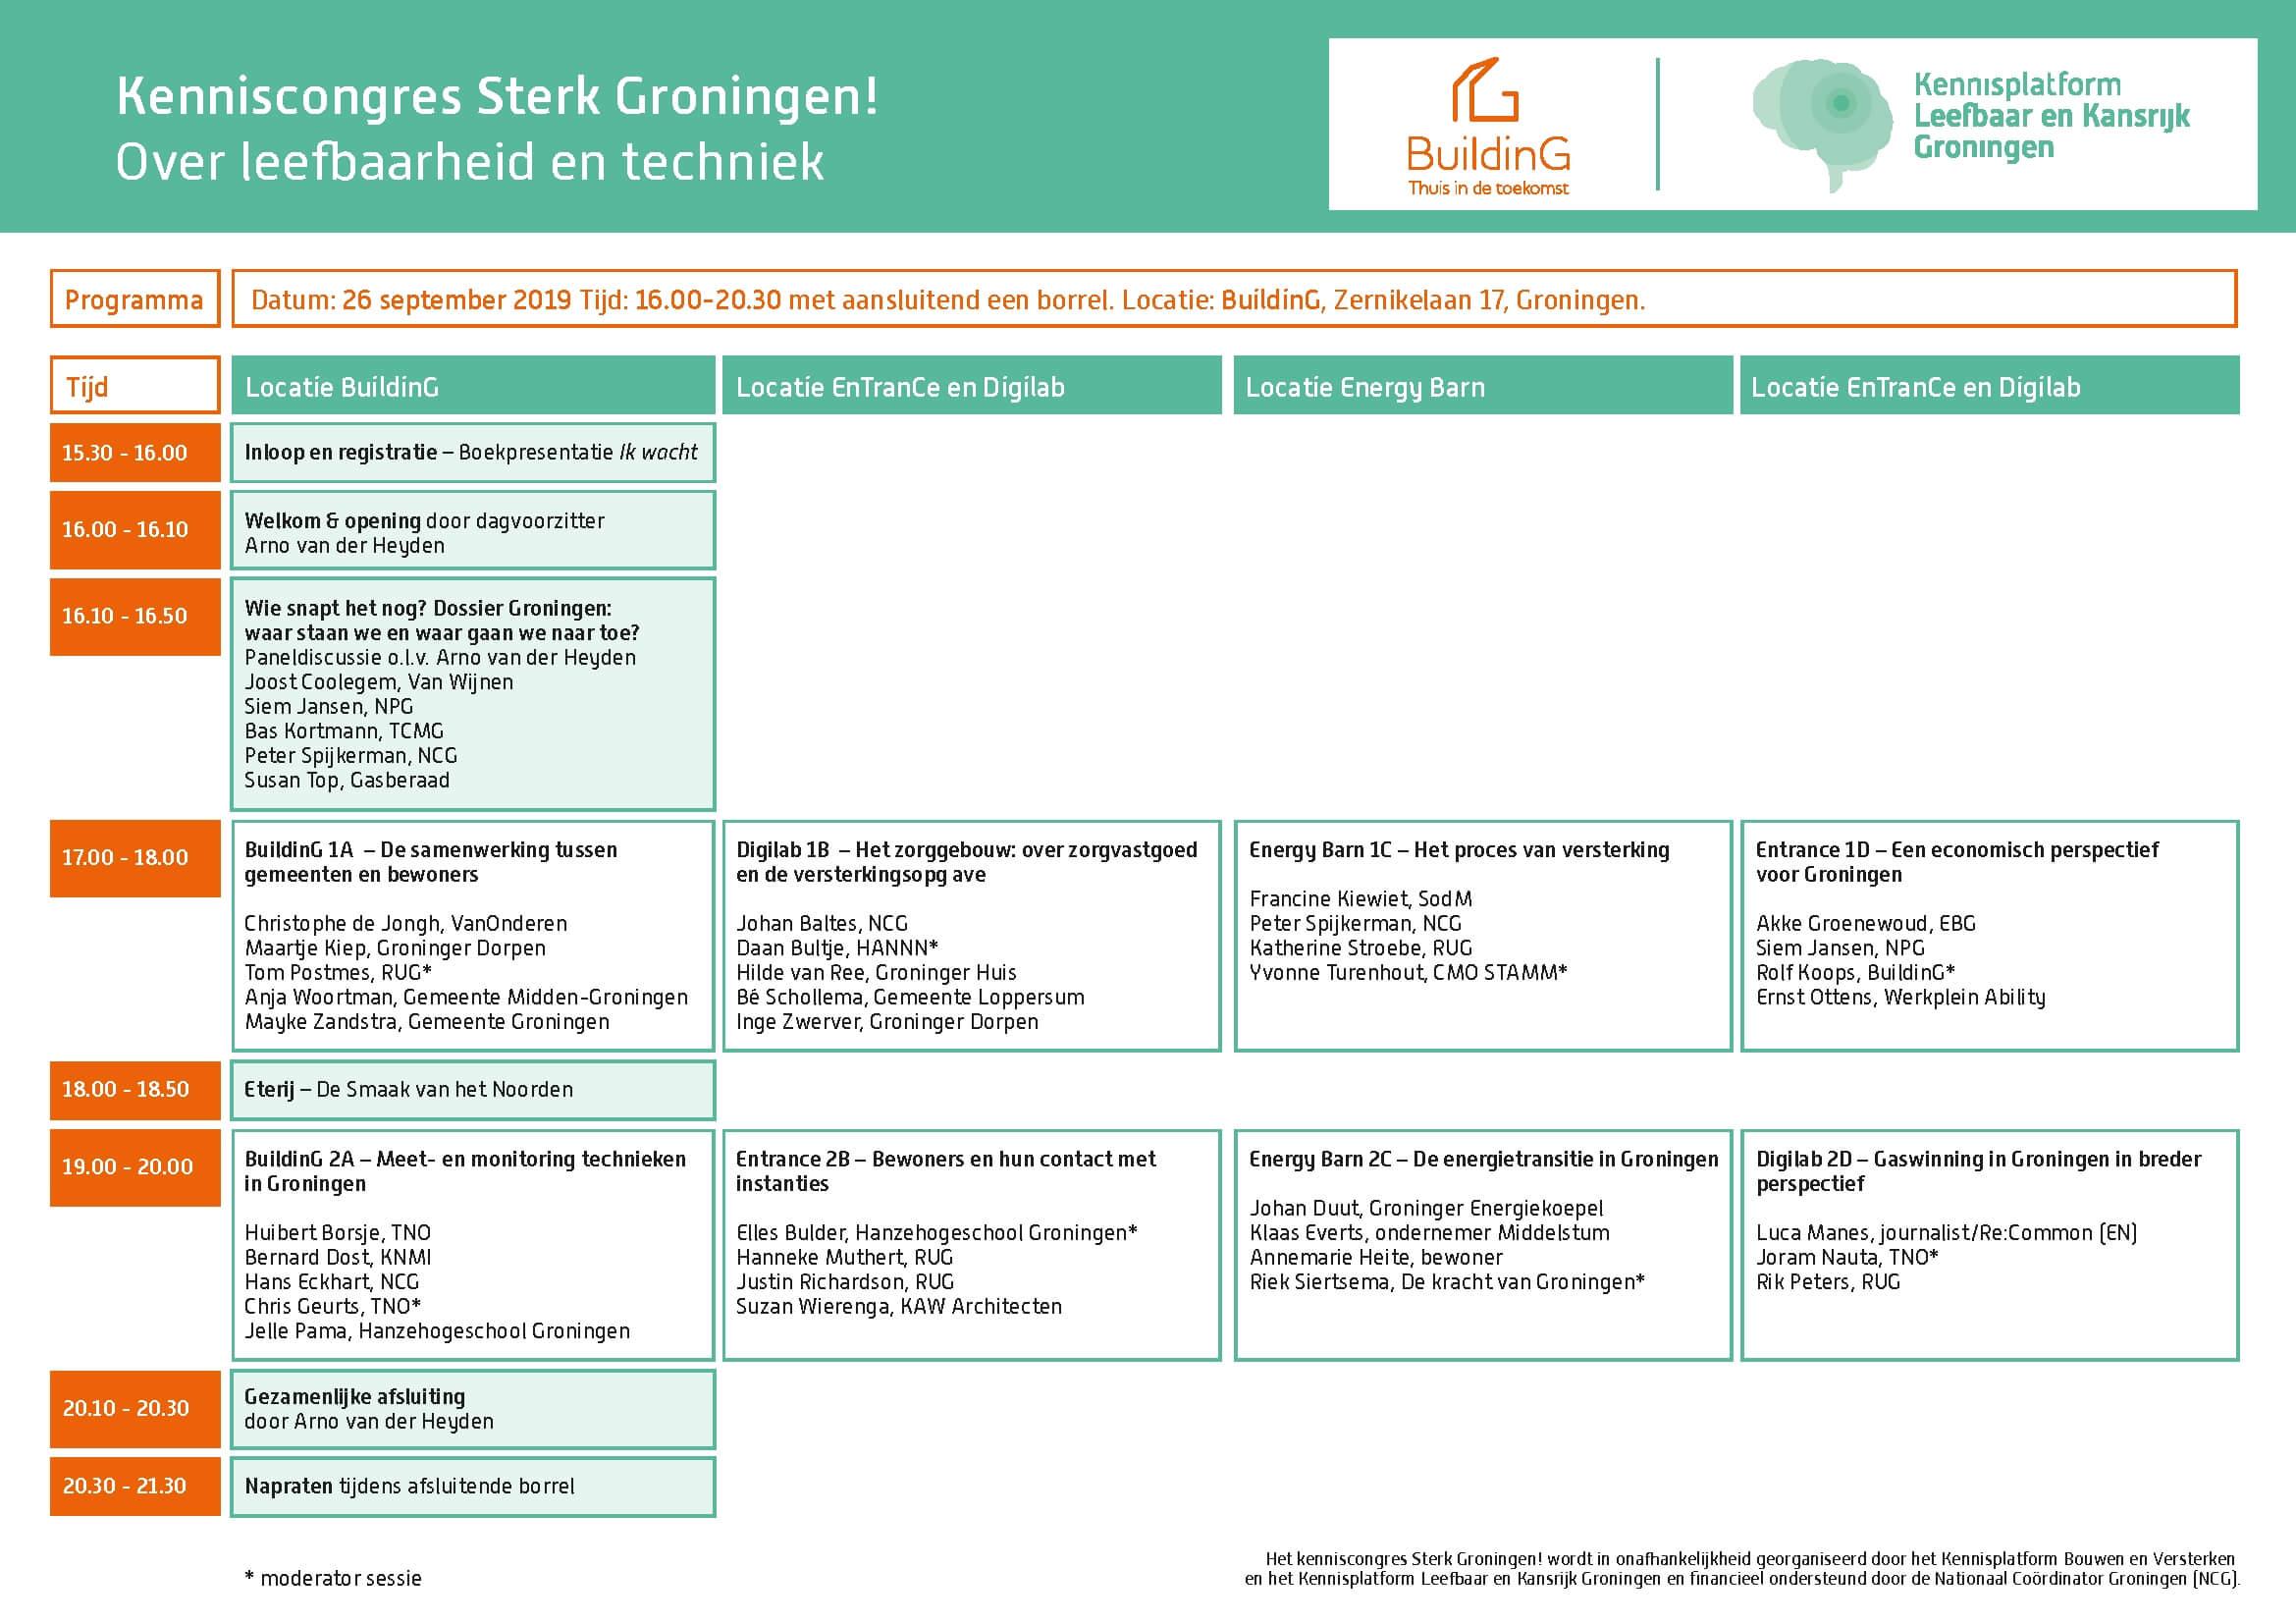 Programma Kenniscongres Sterk Groningen